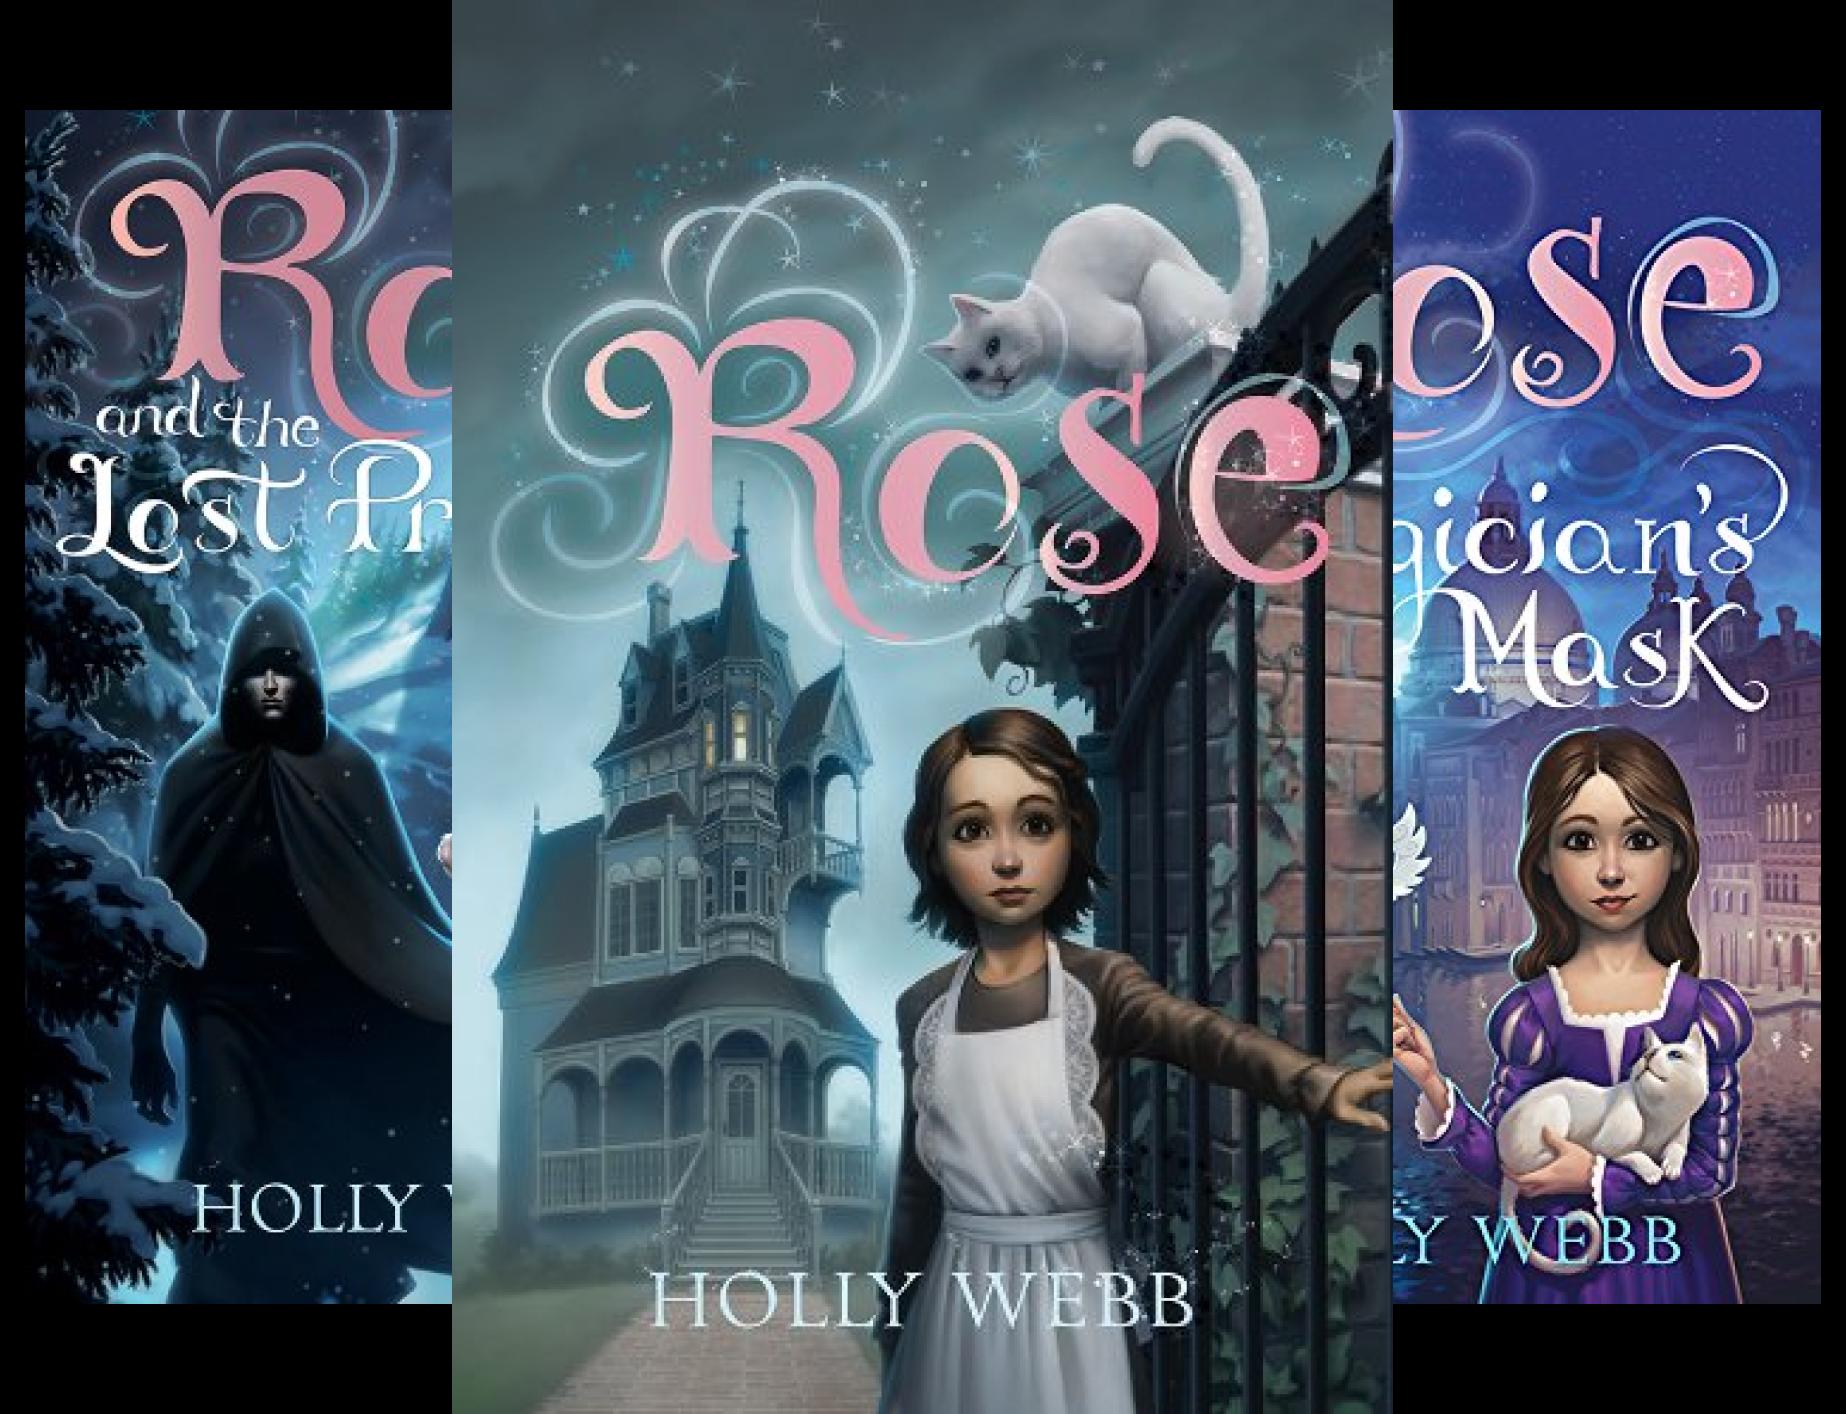 Rose (4 Book Series) (Venice Masks Story)